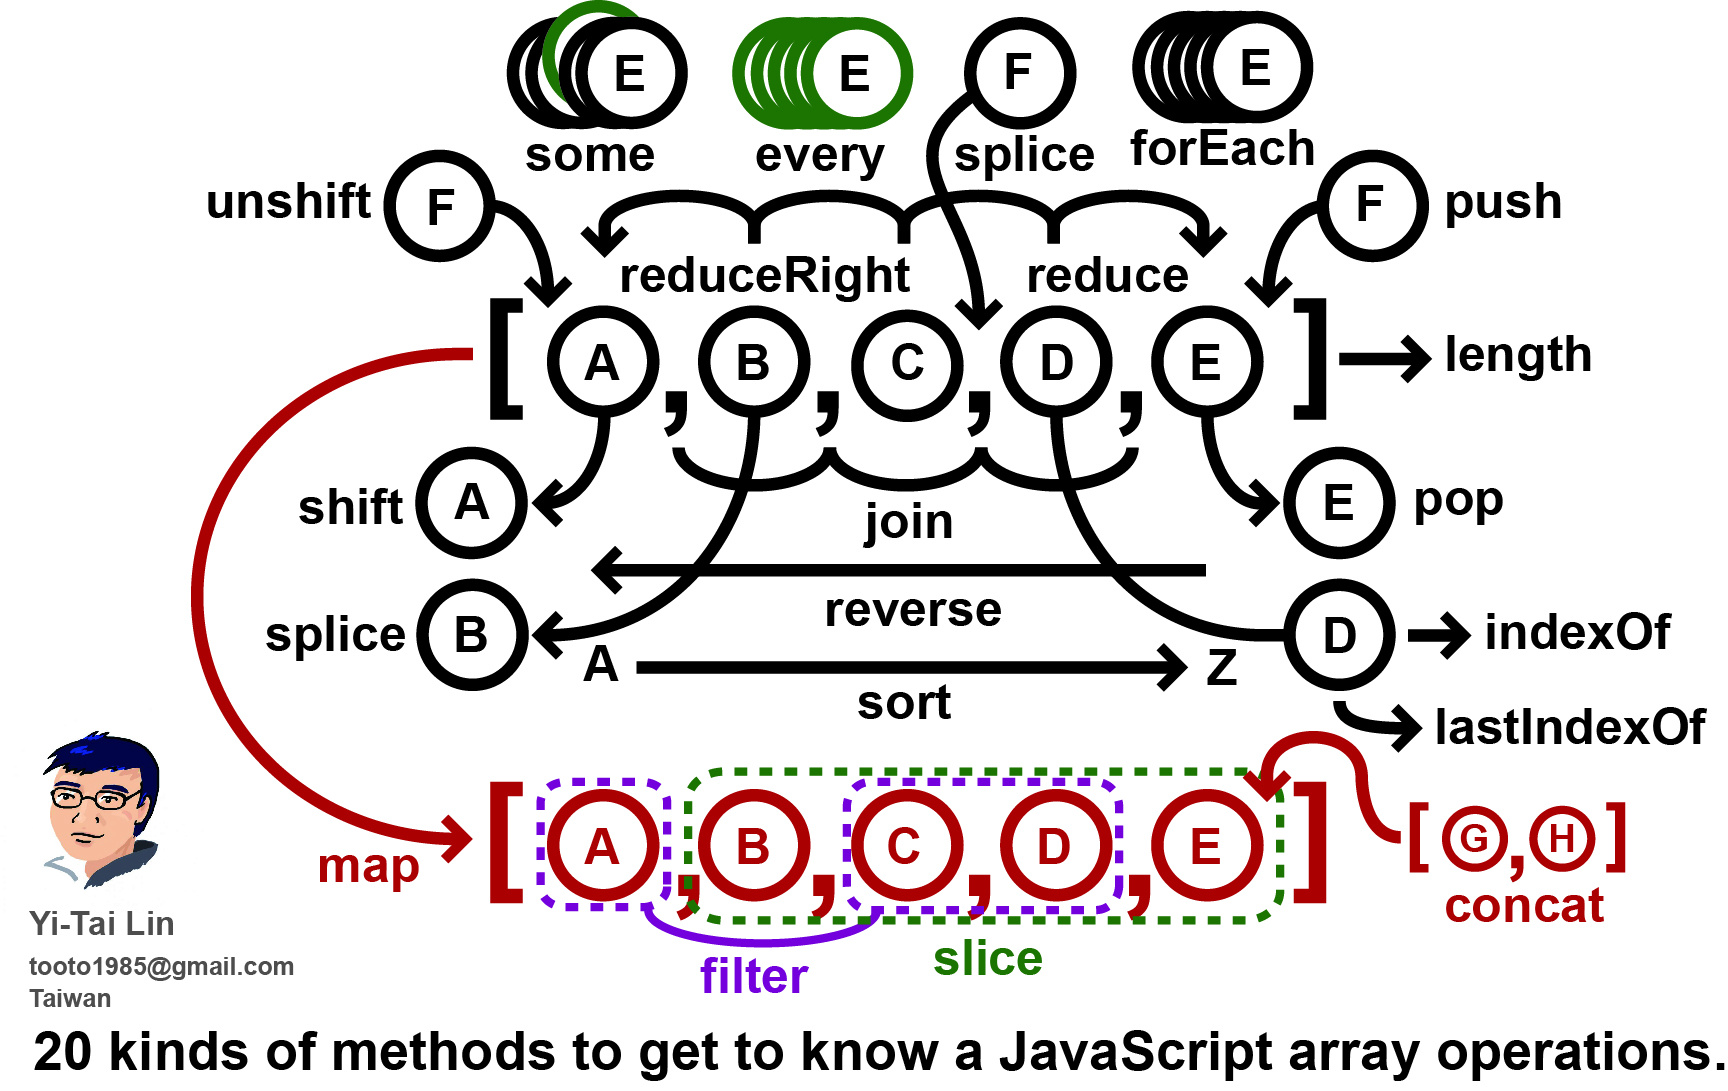 github.com/tooto1985/js-array-operations